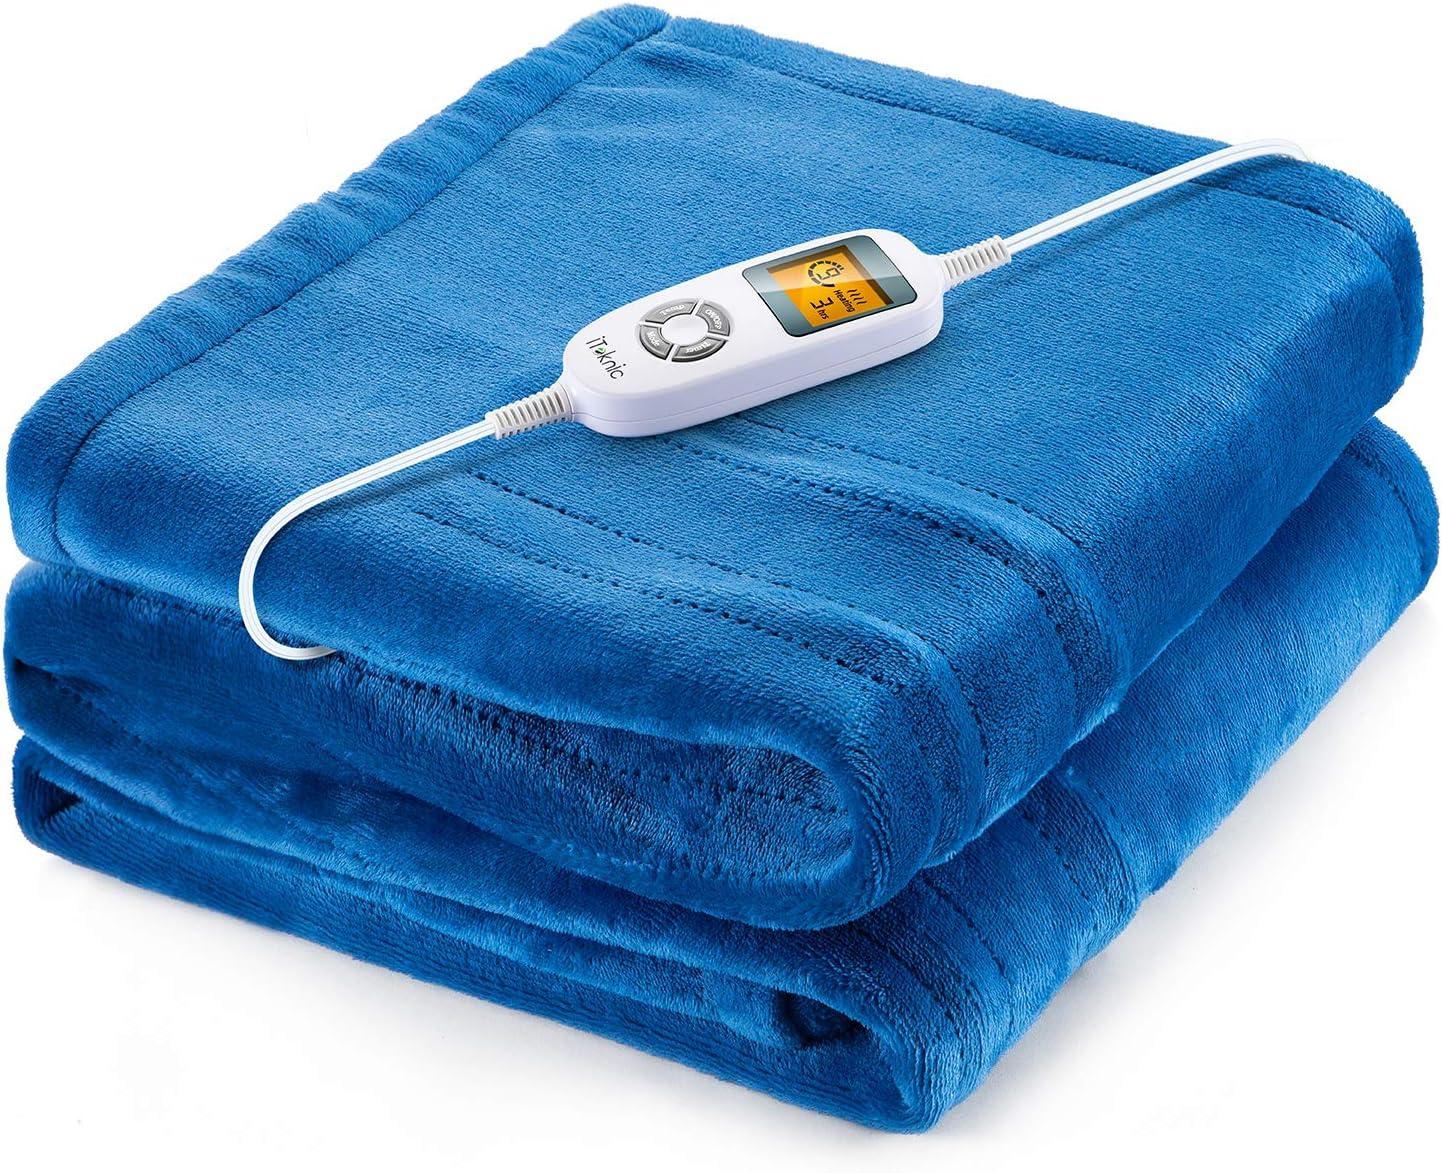 iTeknic Heated Blanket